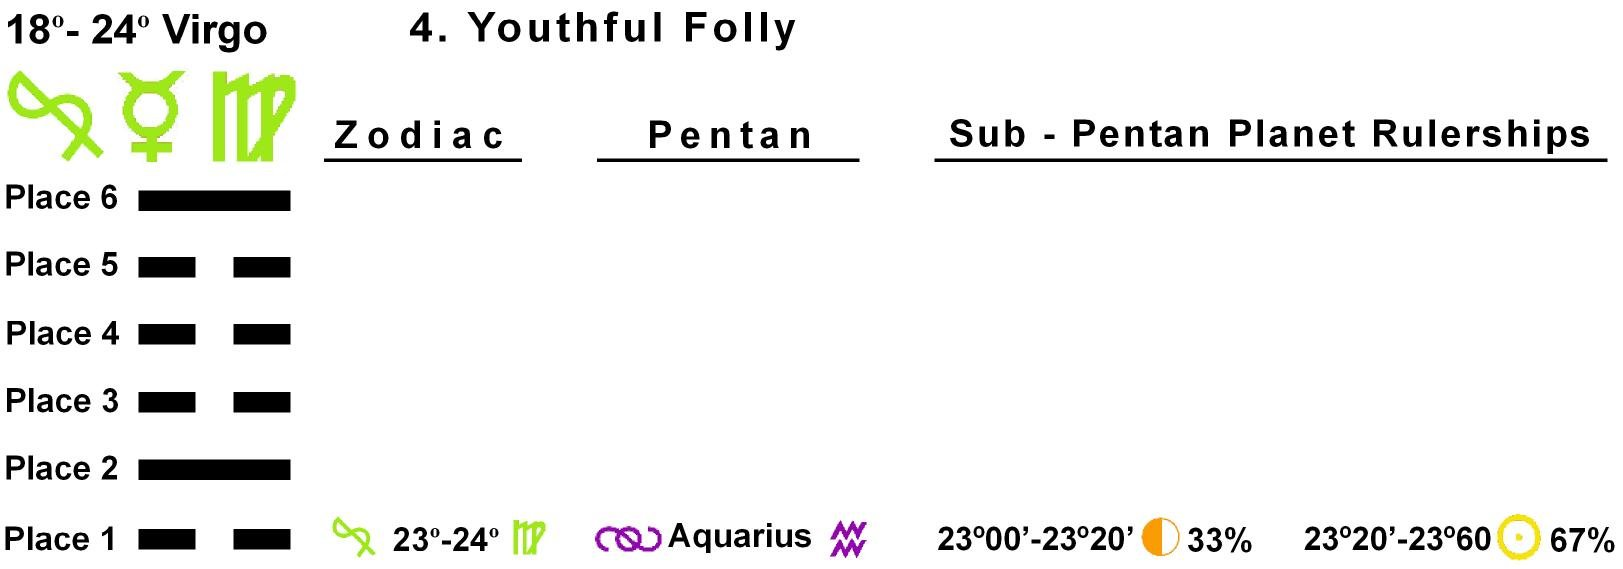 Pent-lines-06VI 23-24 Hx-04 Youthful Folly